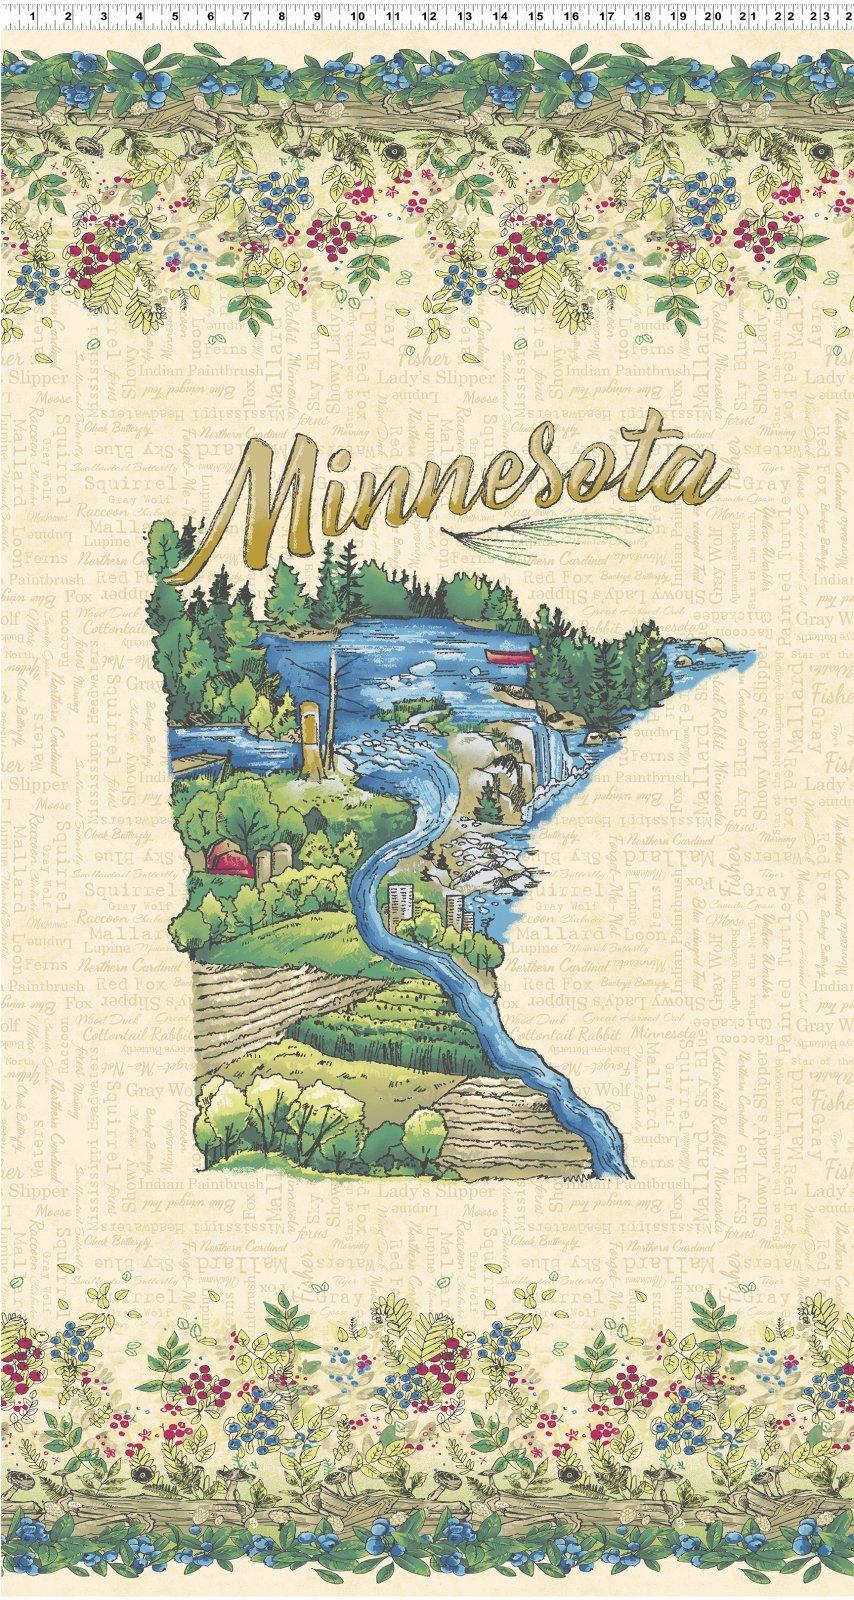 Y2742 64 Minnesota Shape Panel Quilt Minnesota 2019 Shop Hop Fabric